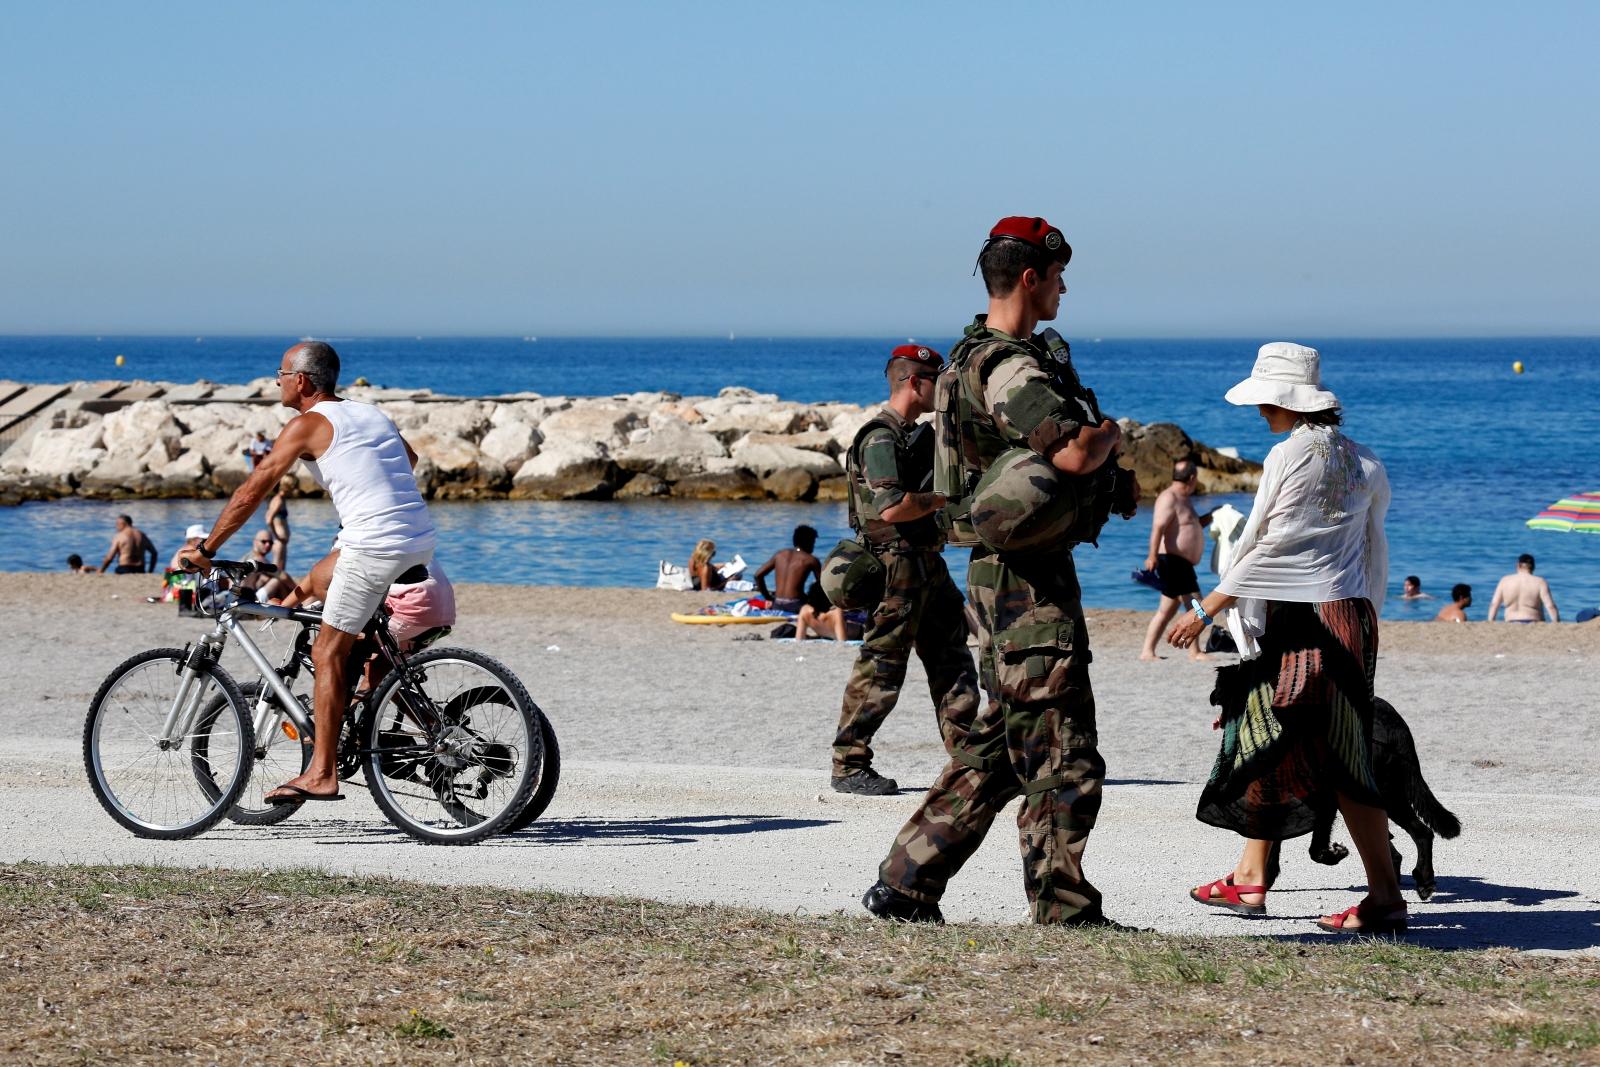 France de-radicalisation jihadists